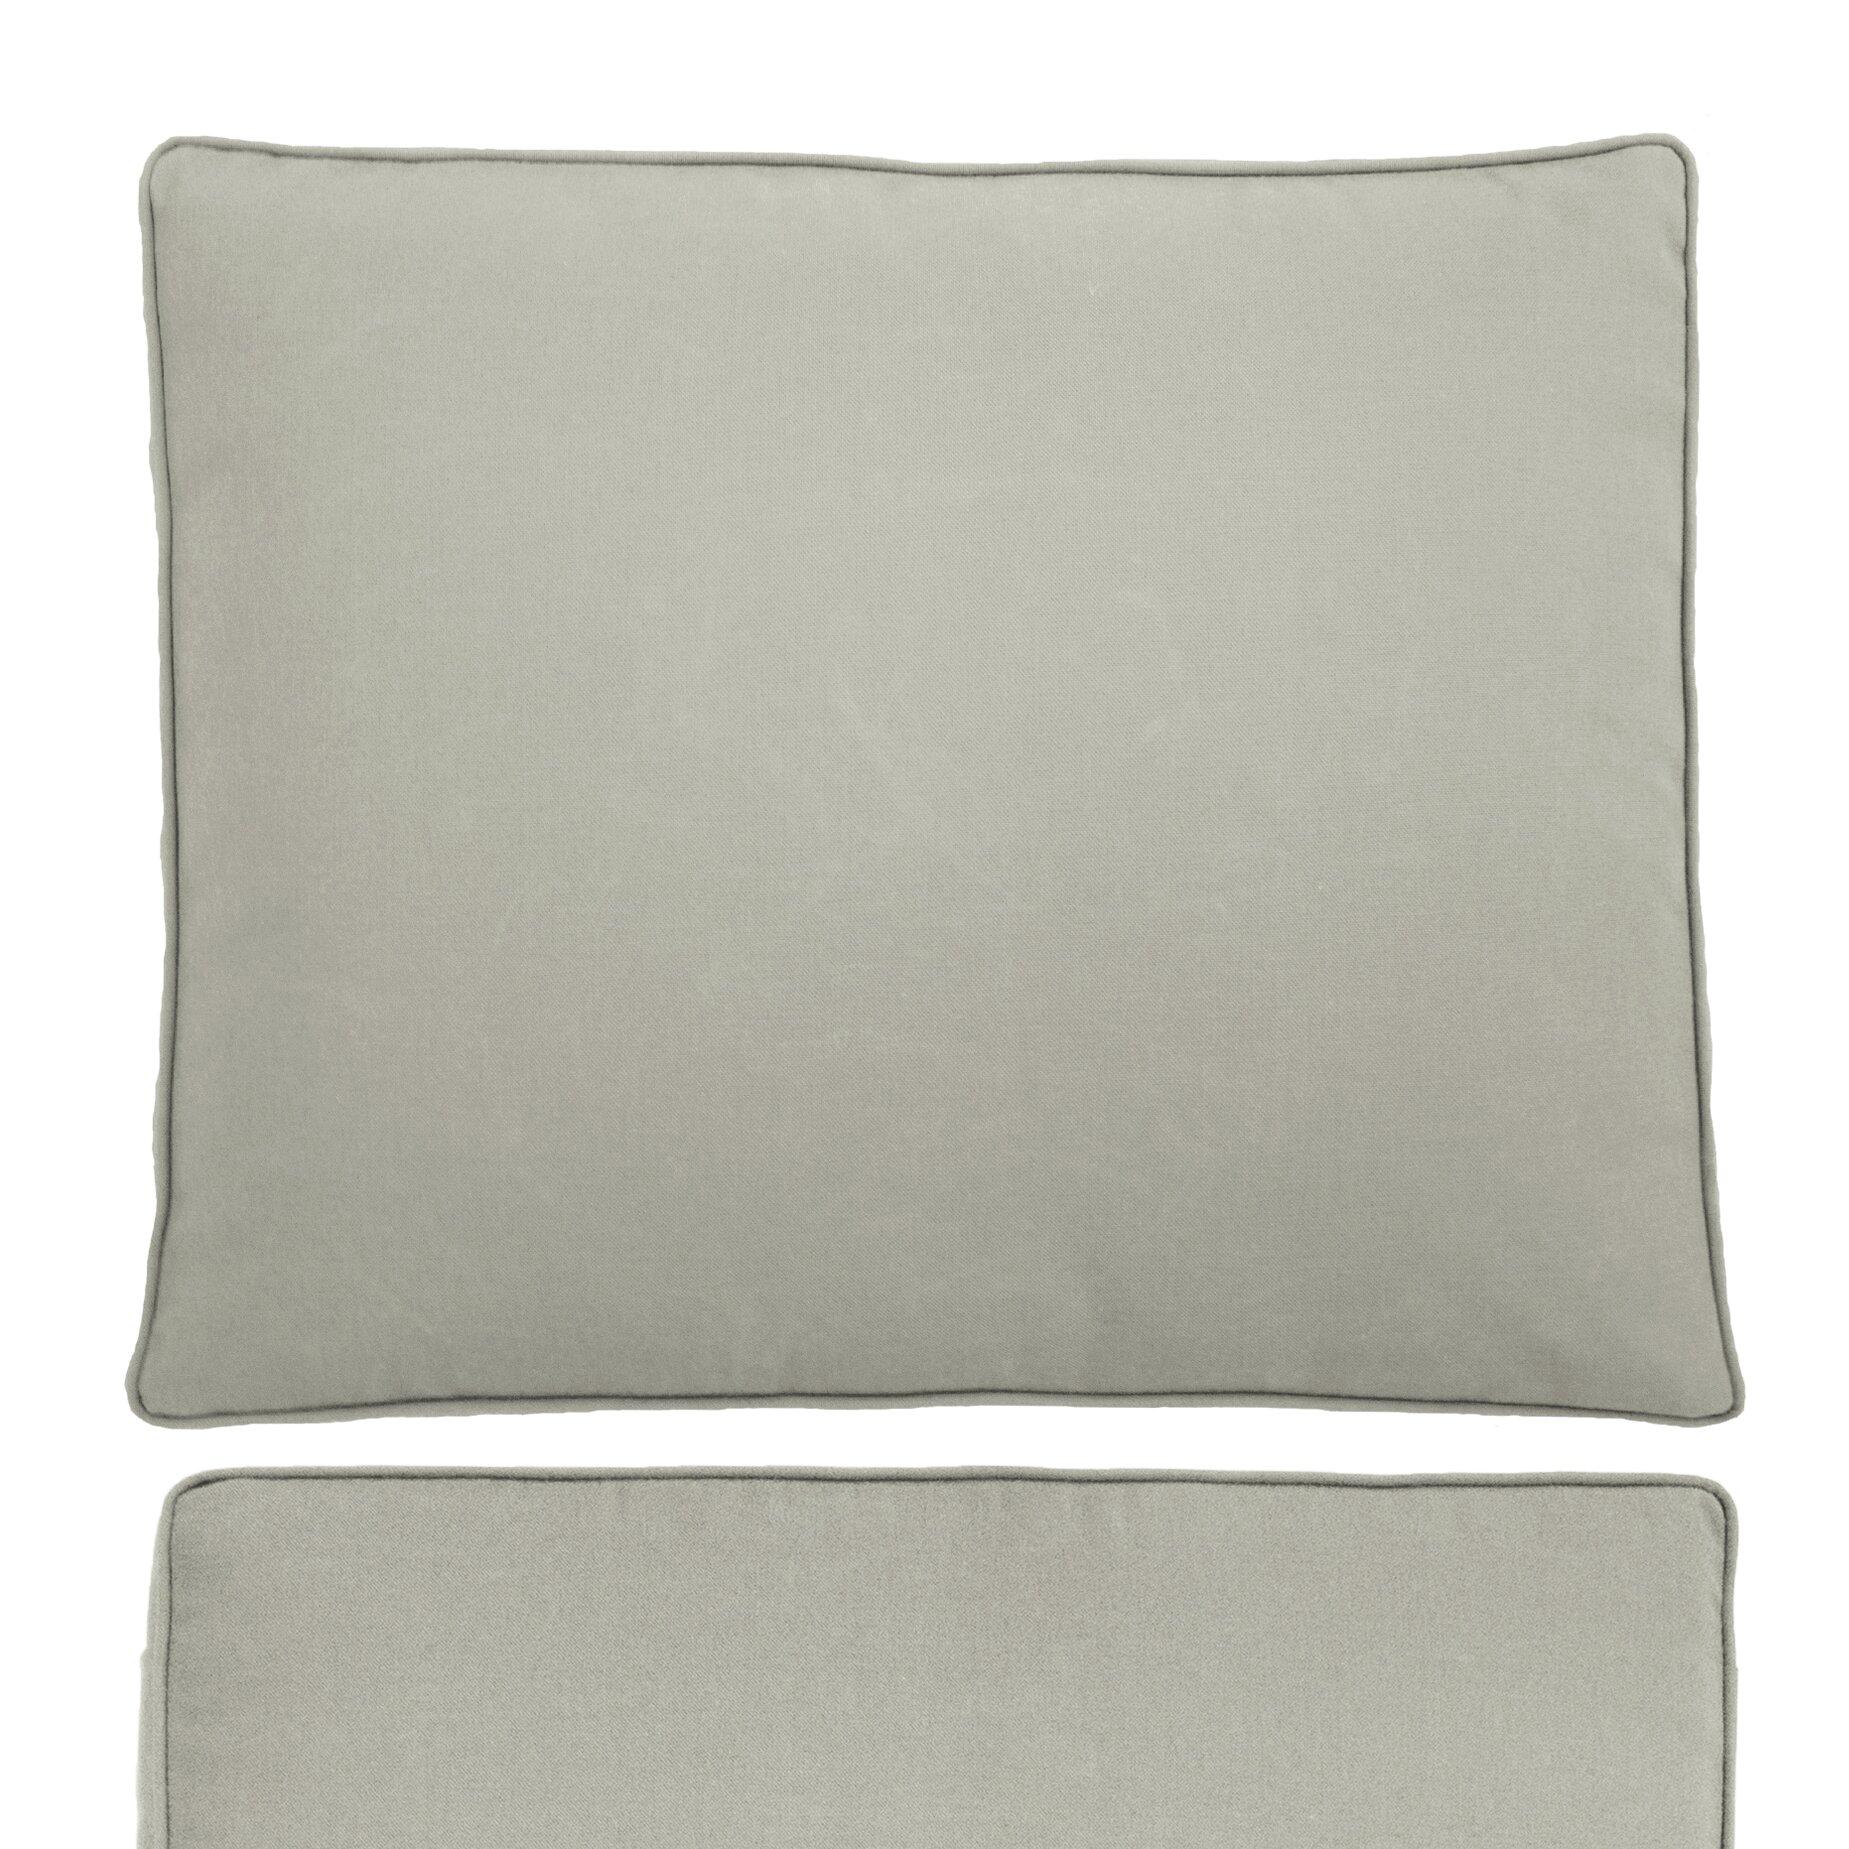 Wayfair Custom Outdoor Cushions Outdoor Sunbrella Double